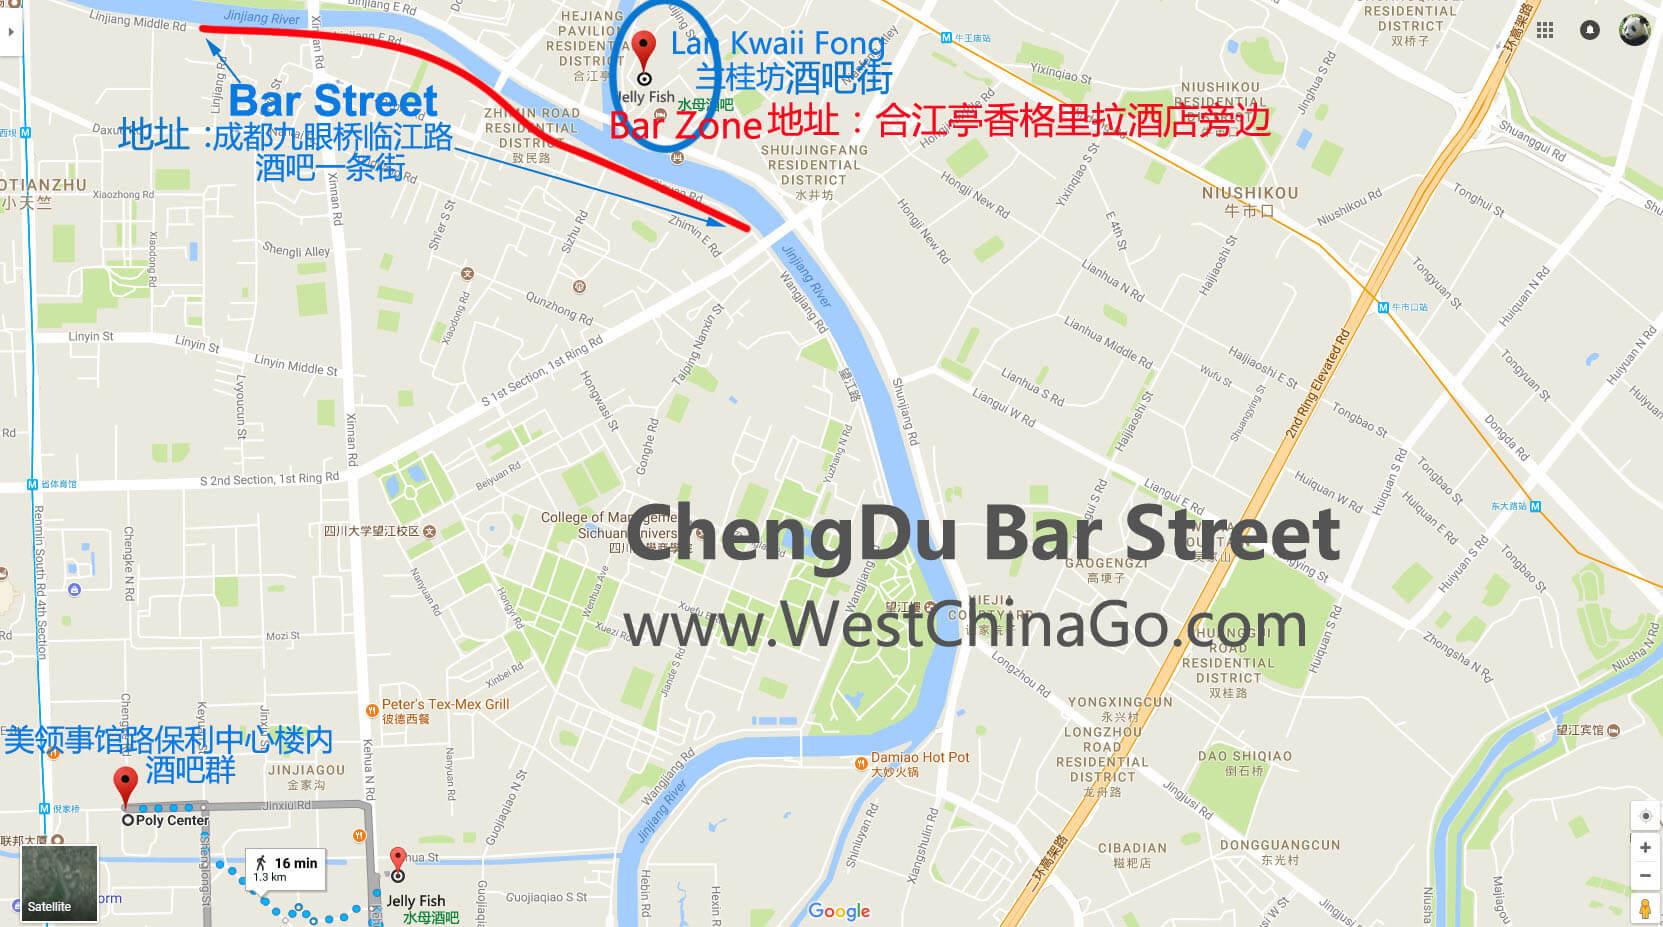 chengdu bar street